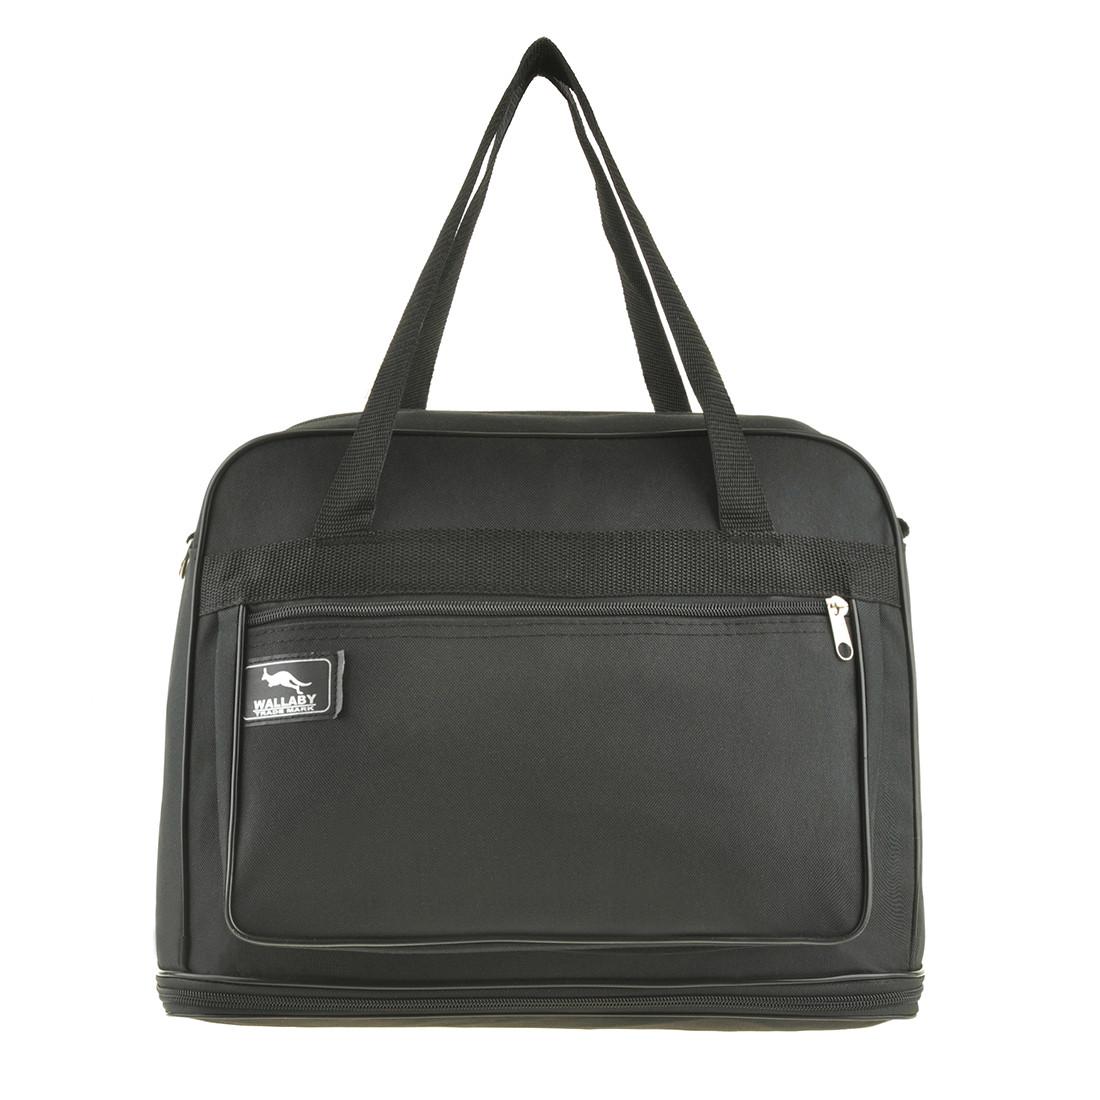 Дорожная сумка-трансформер Wallaby 39 х 29(+12) х 20 ткань полиэстер 600Д 1 раскладка вниз в 2070